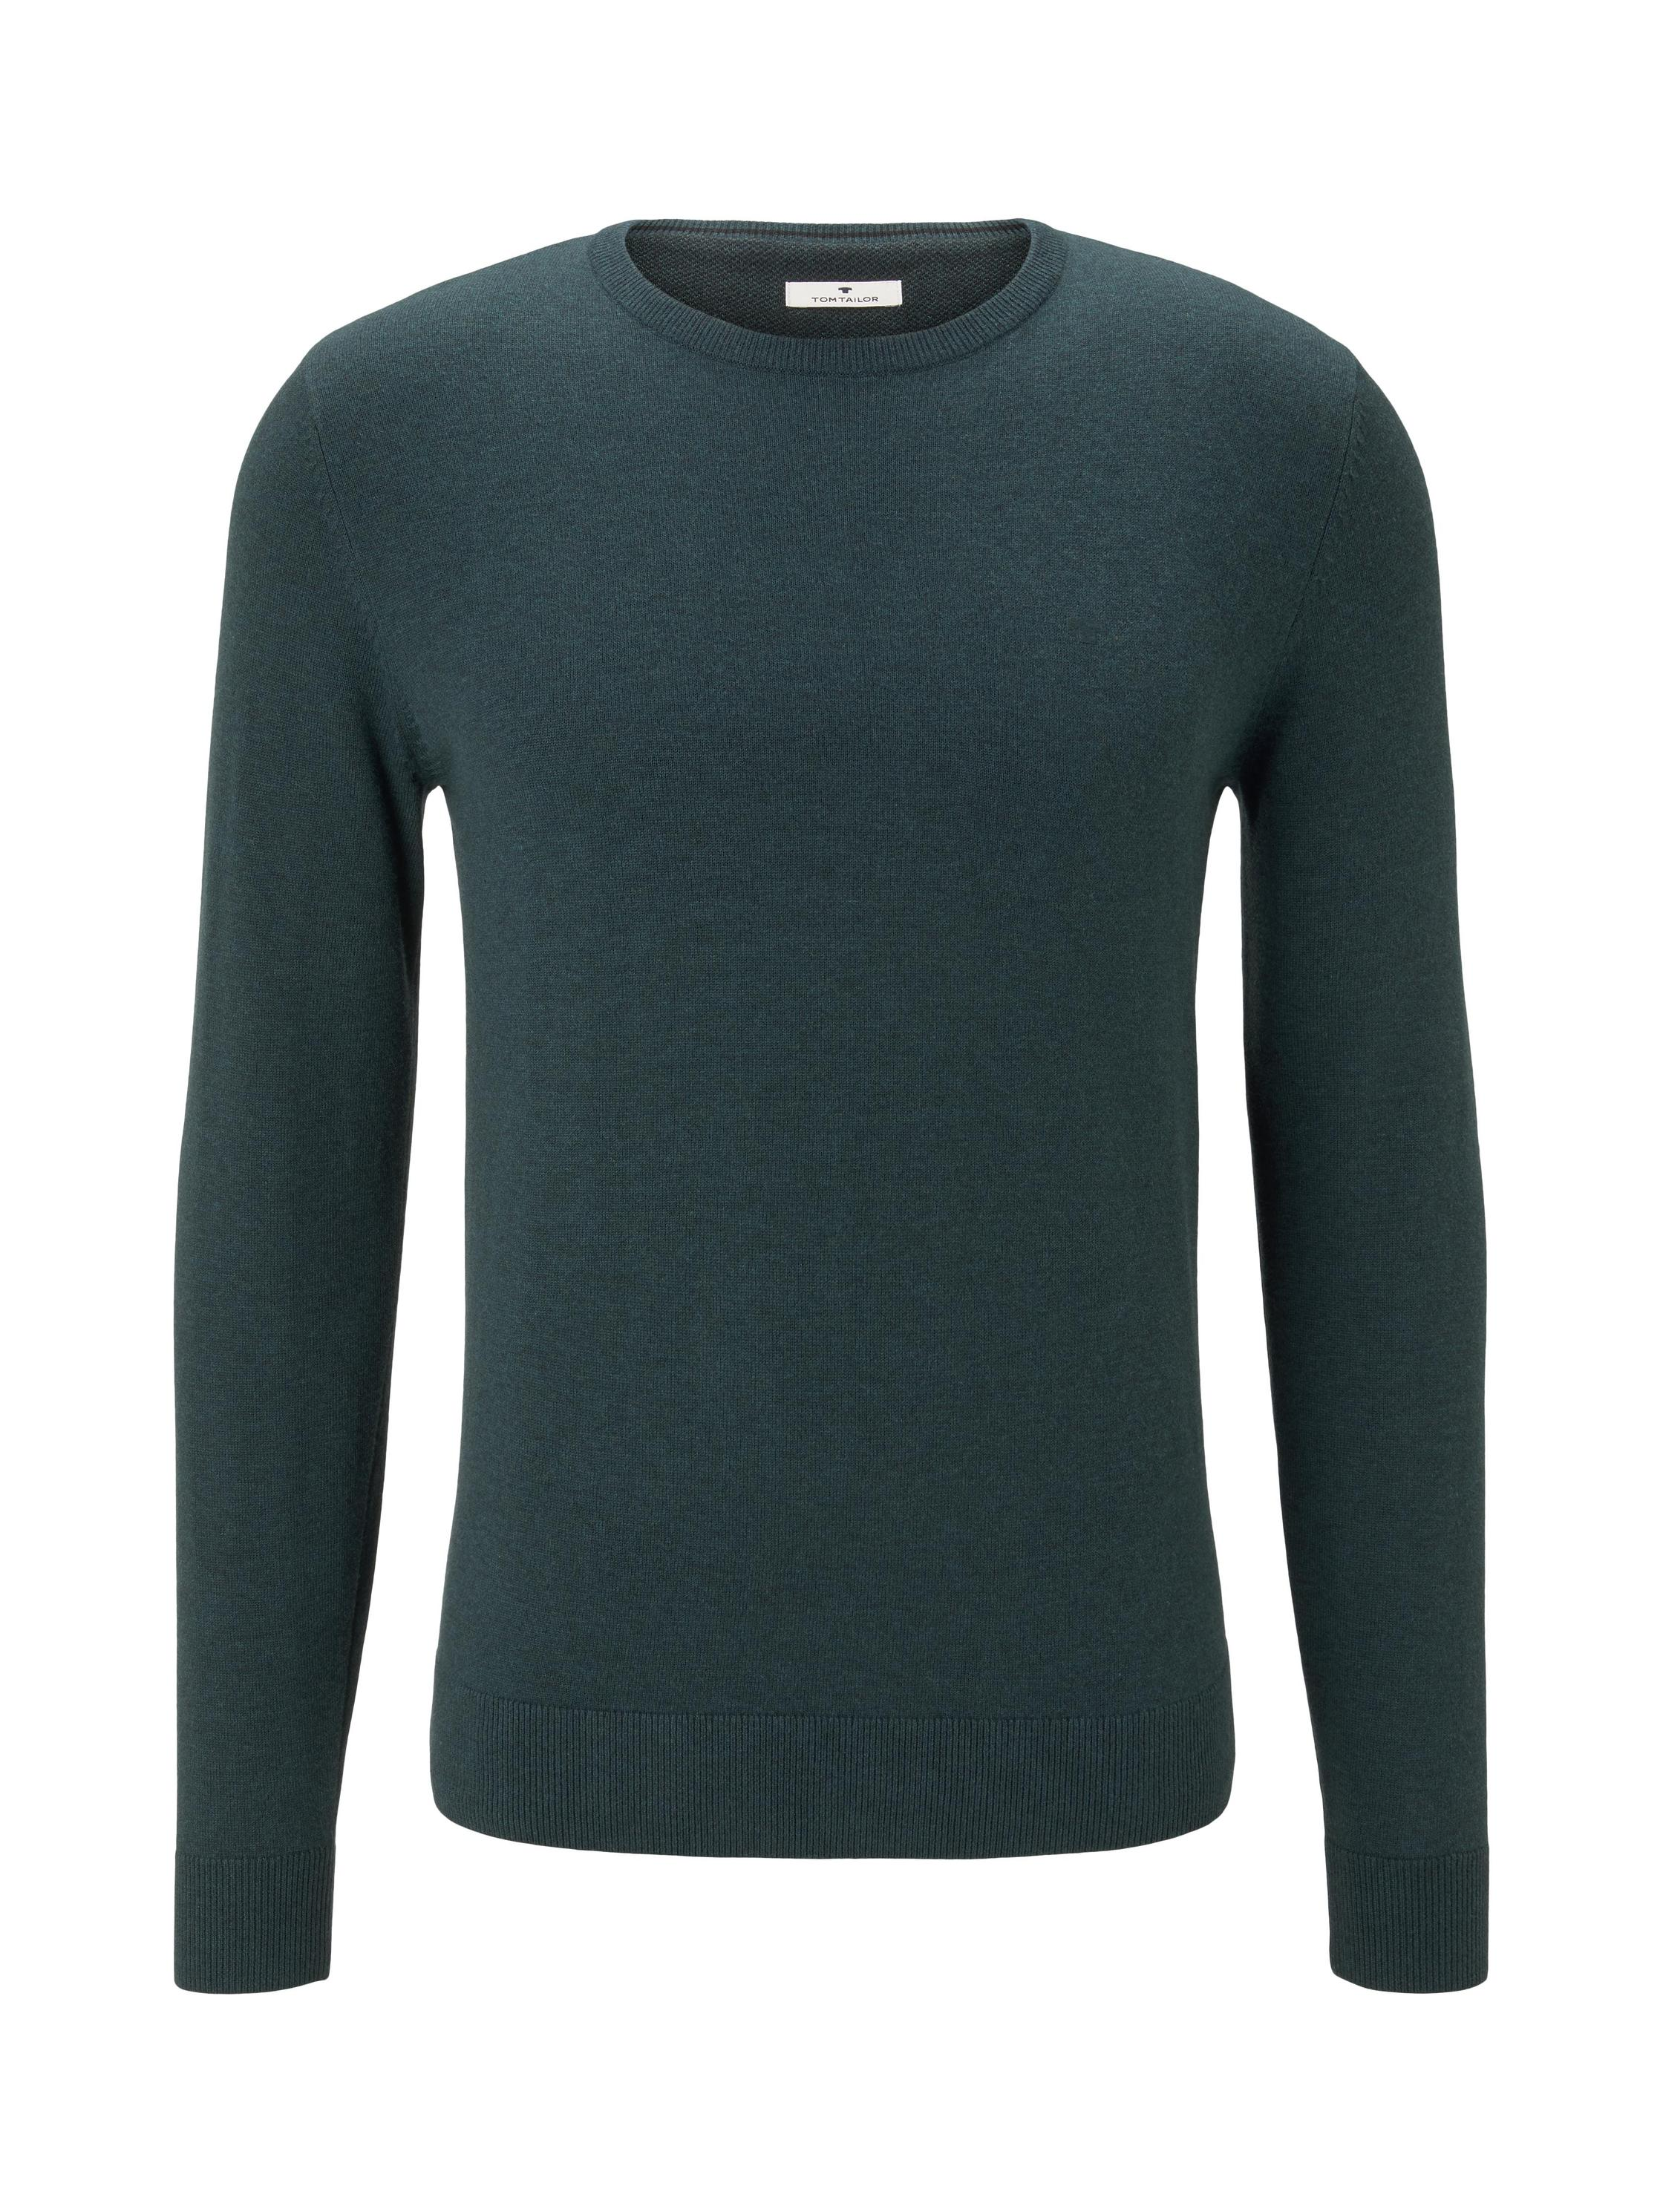 basic crew neck sweater, sapphire green melange